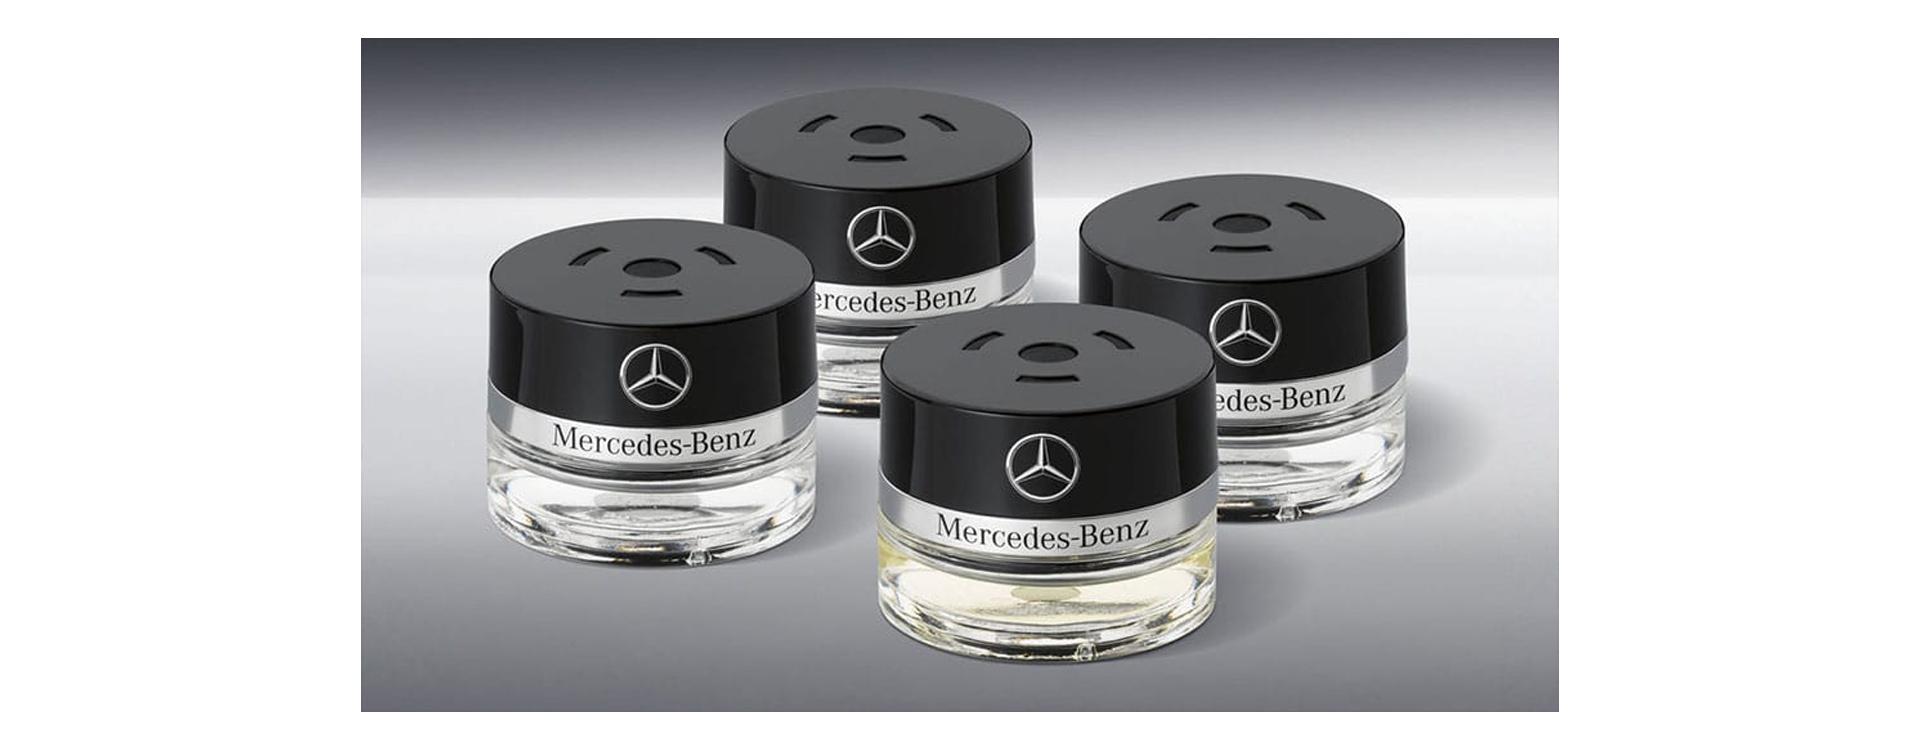 Mercedes-Benz Fragrance Refills